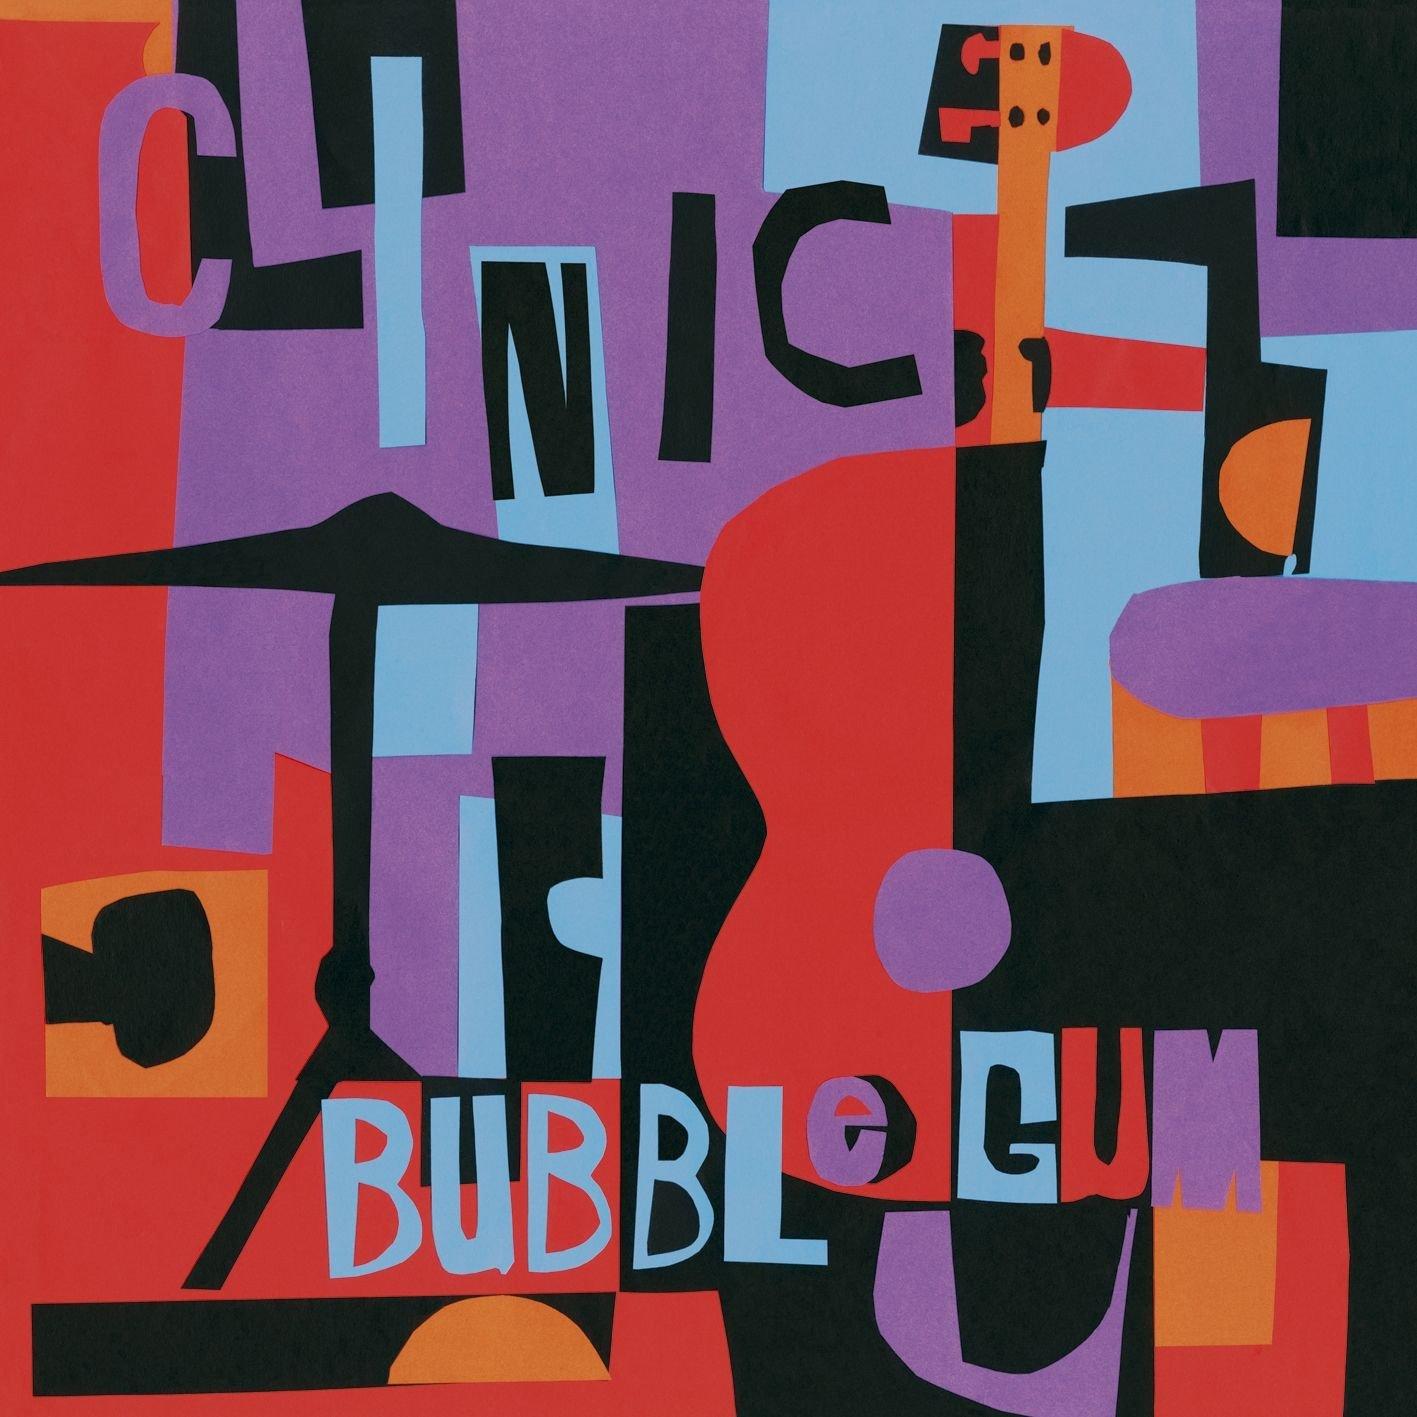 CD : Clinic - Bubblegum (CD)